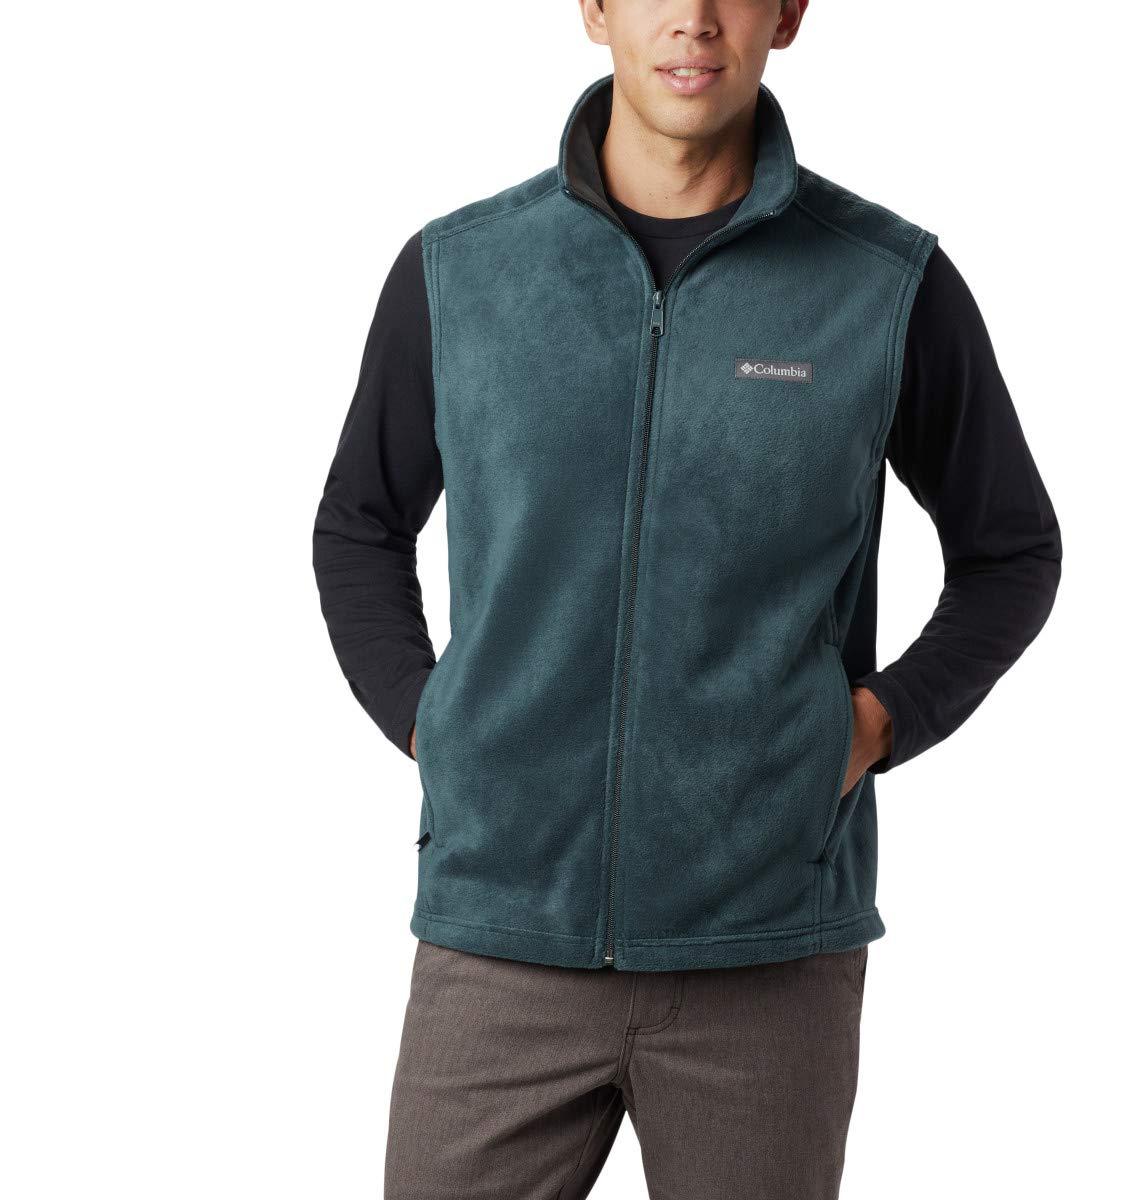 Columbia Men's Steens Mountain Vest, Night Shadow, Medium by Columbia